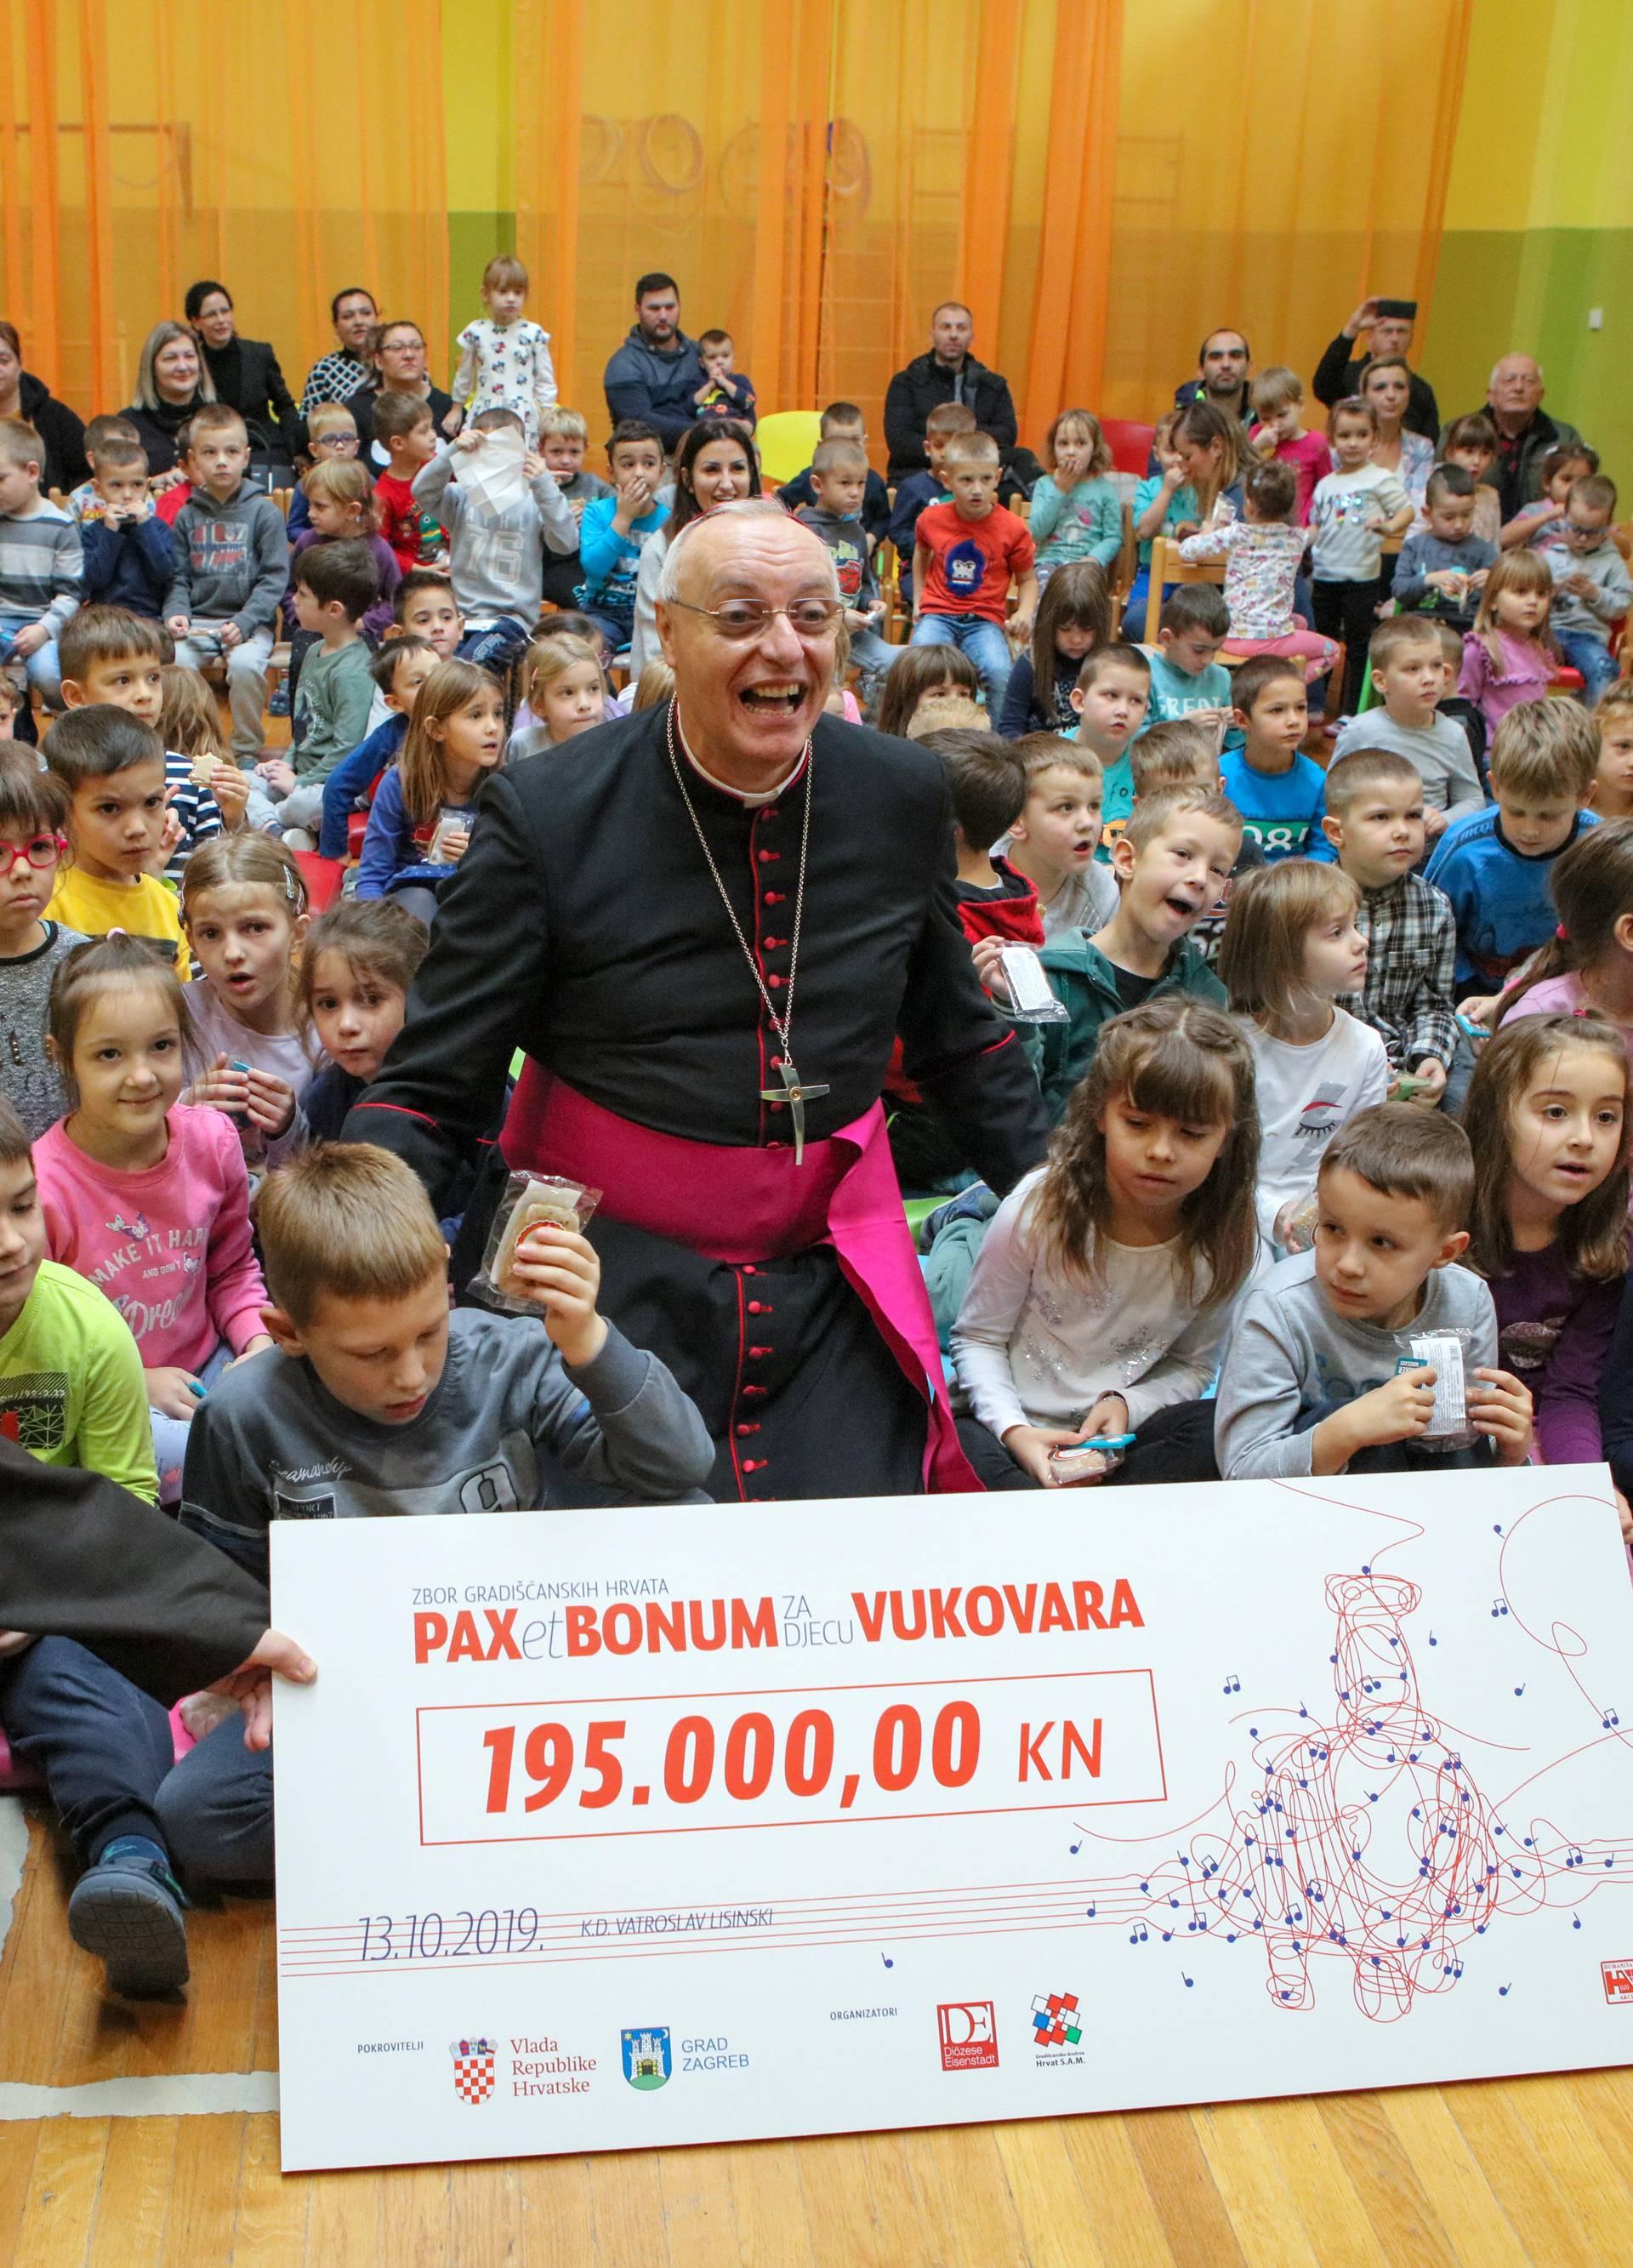 Vukovar: Delegacija gradiščanskih Hrvata i Milan Bandić donirali novac vukovarskom vrtiću